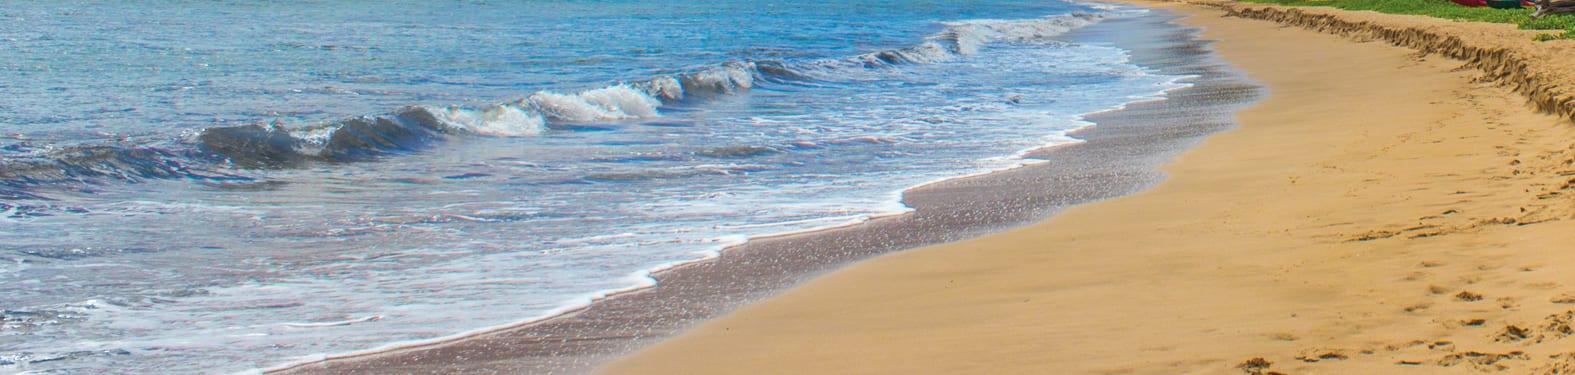 Lanai Beach - 2554